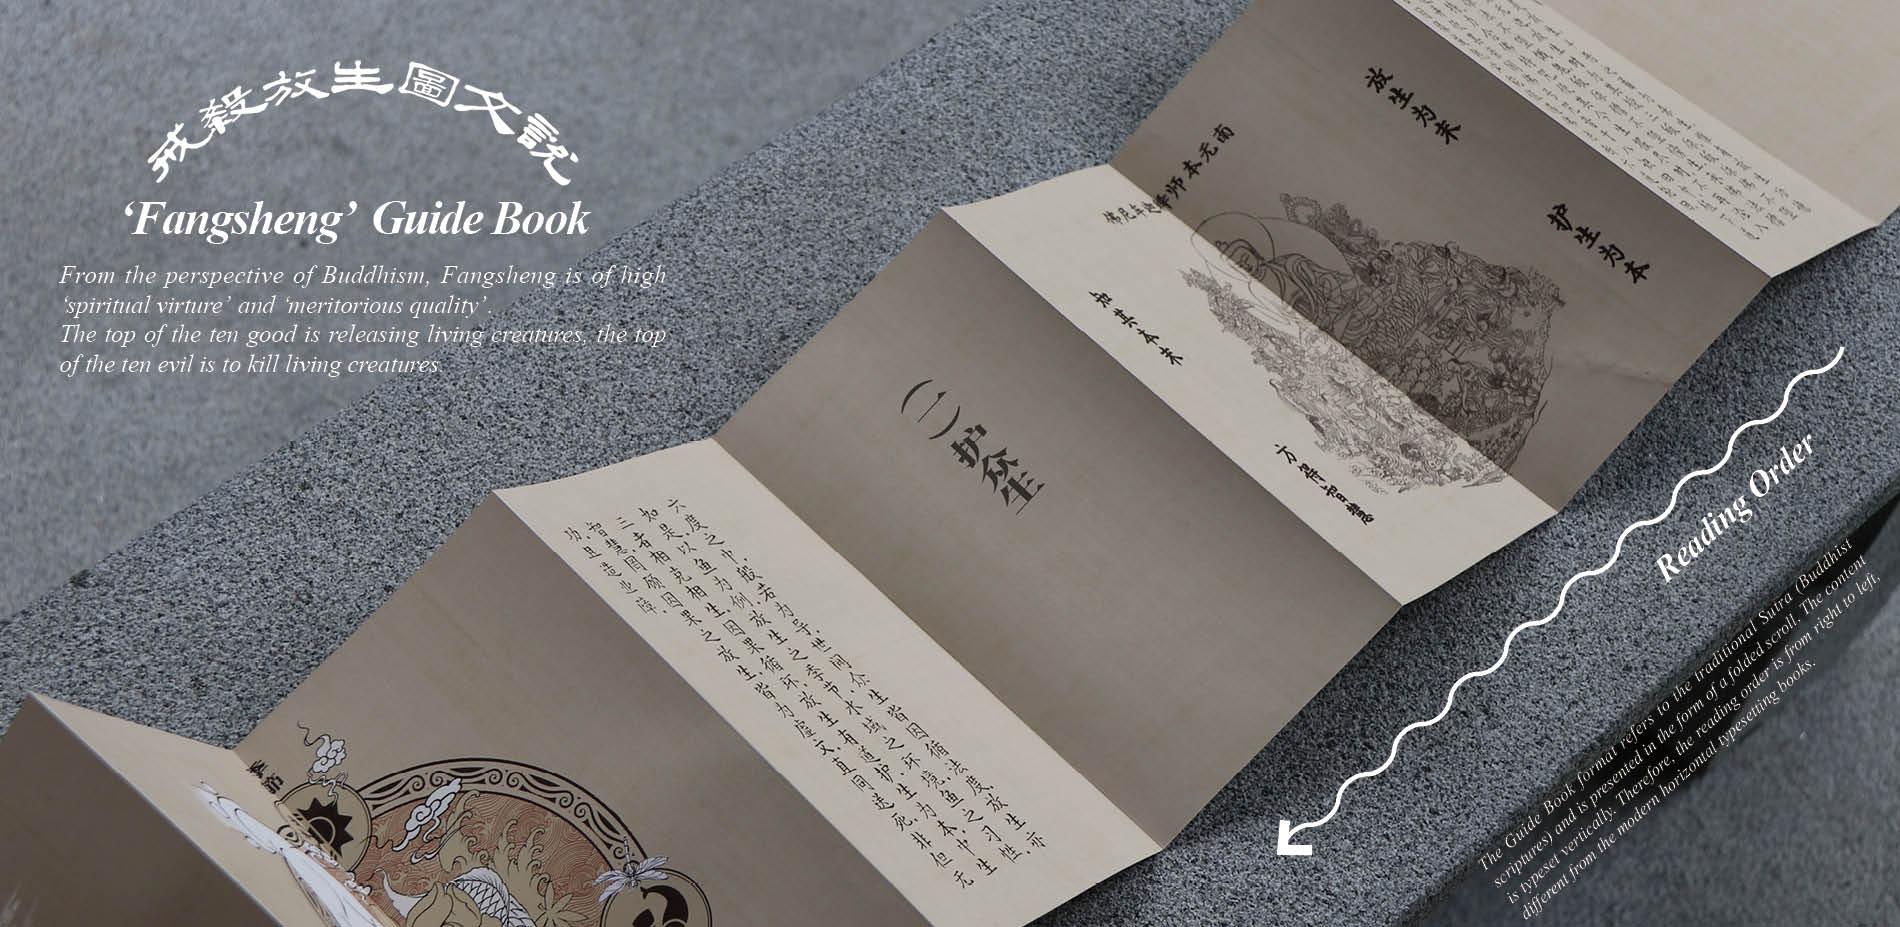 The design of 'Fangsheng' Guide Book